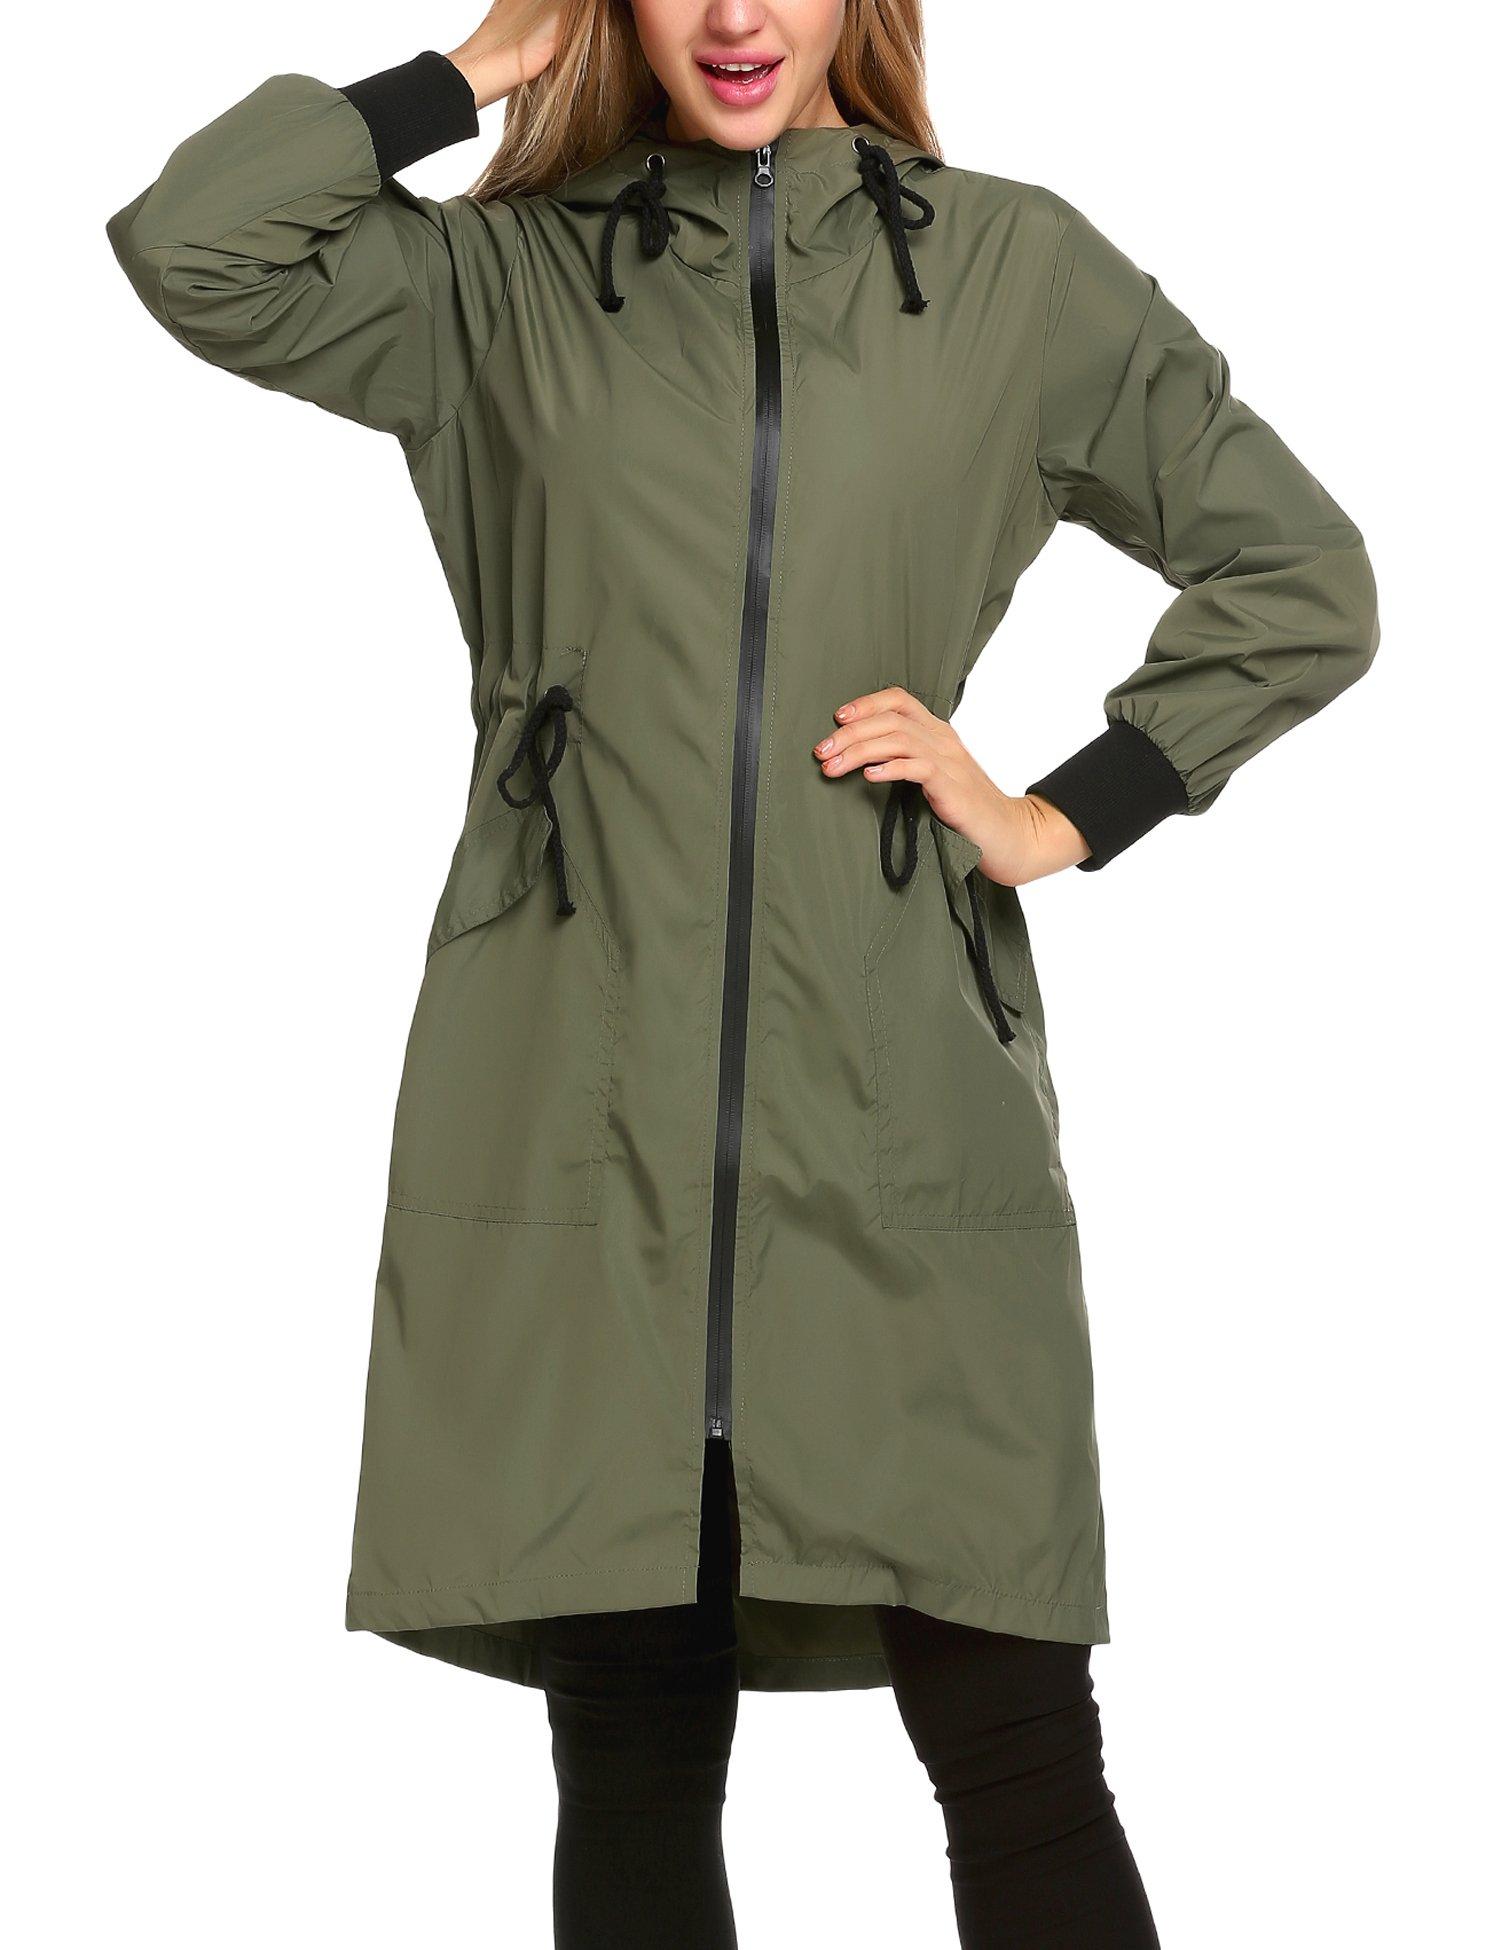 Zeagoo Women's Lightweight Hooded Waterproof Active Outdoor Rain Jacket, Army Green, Small